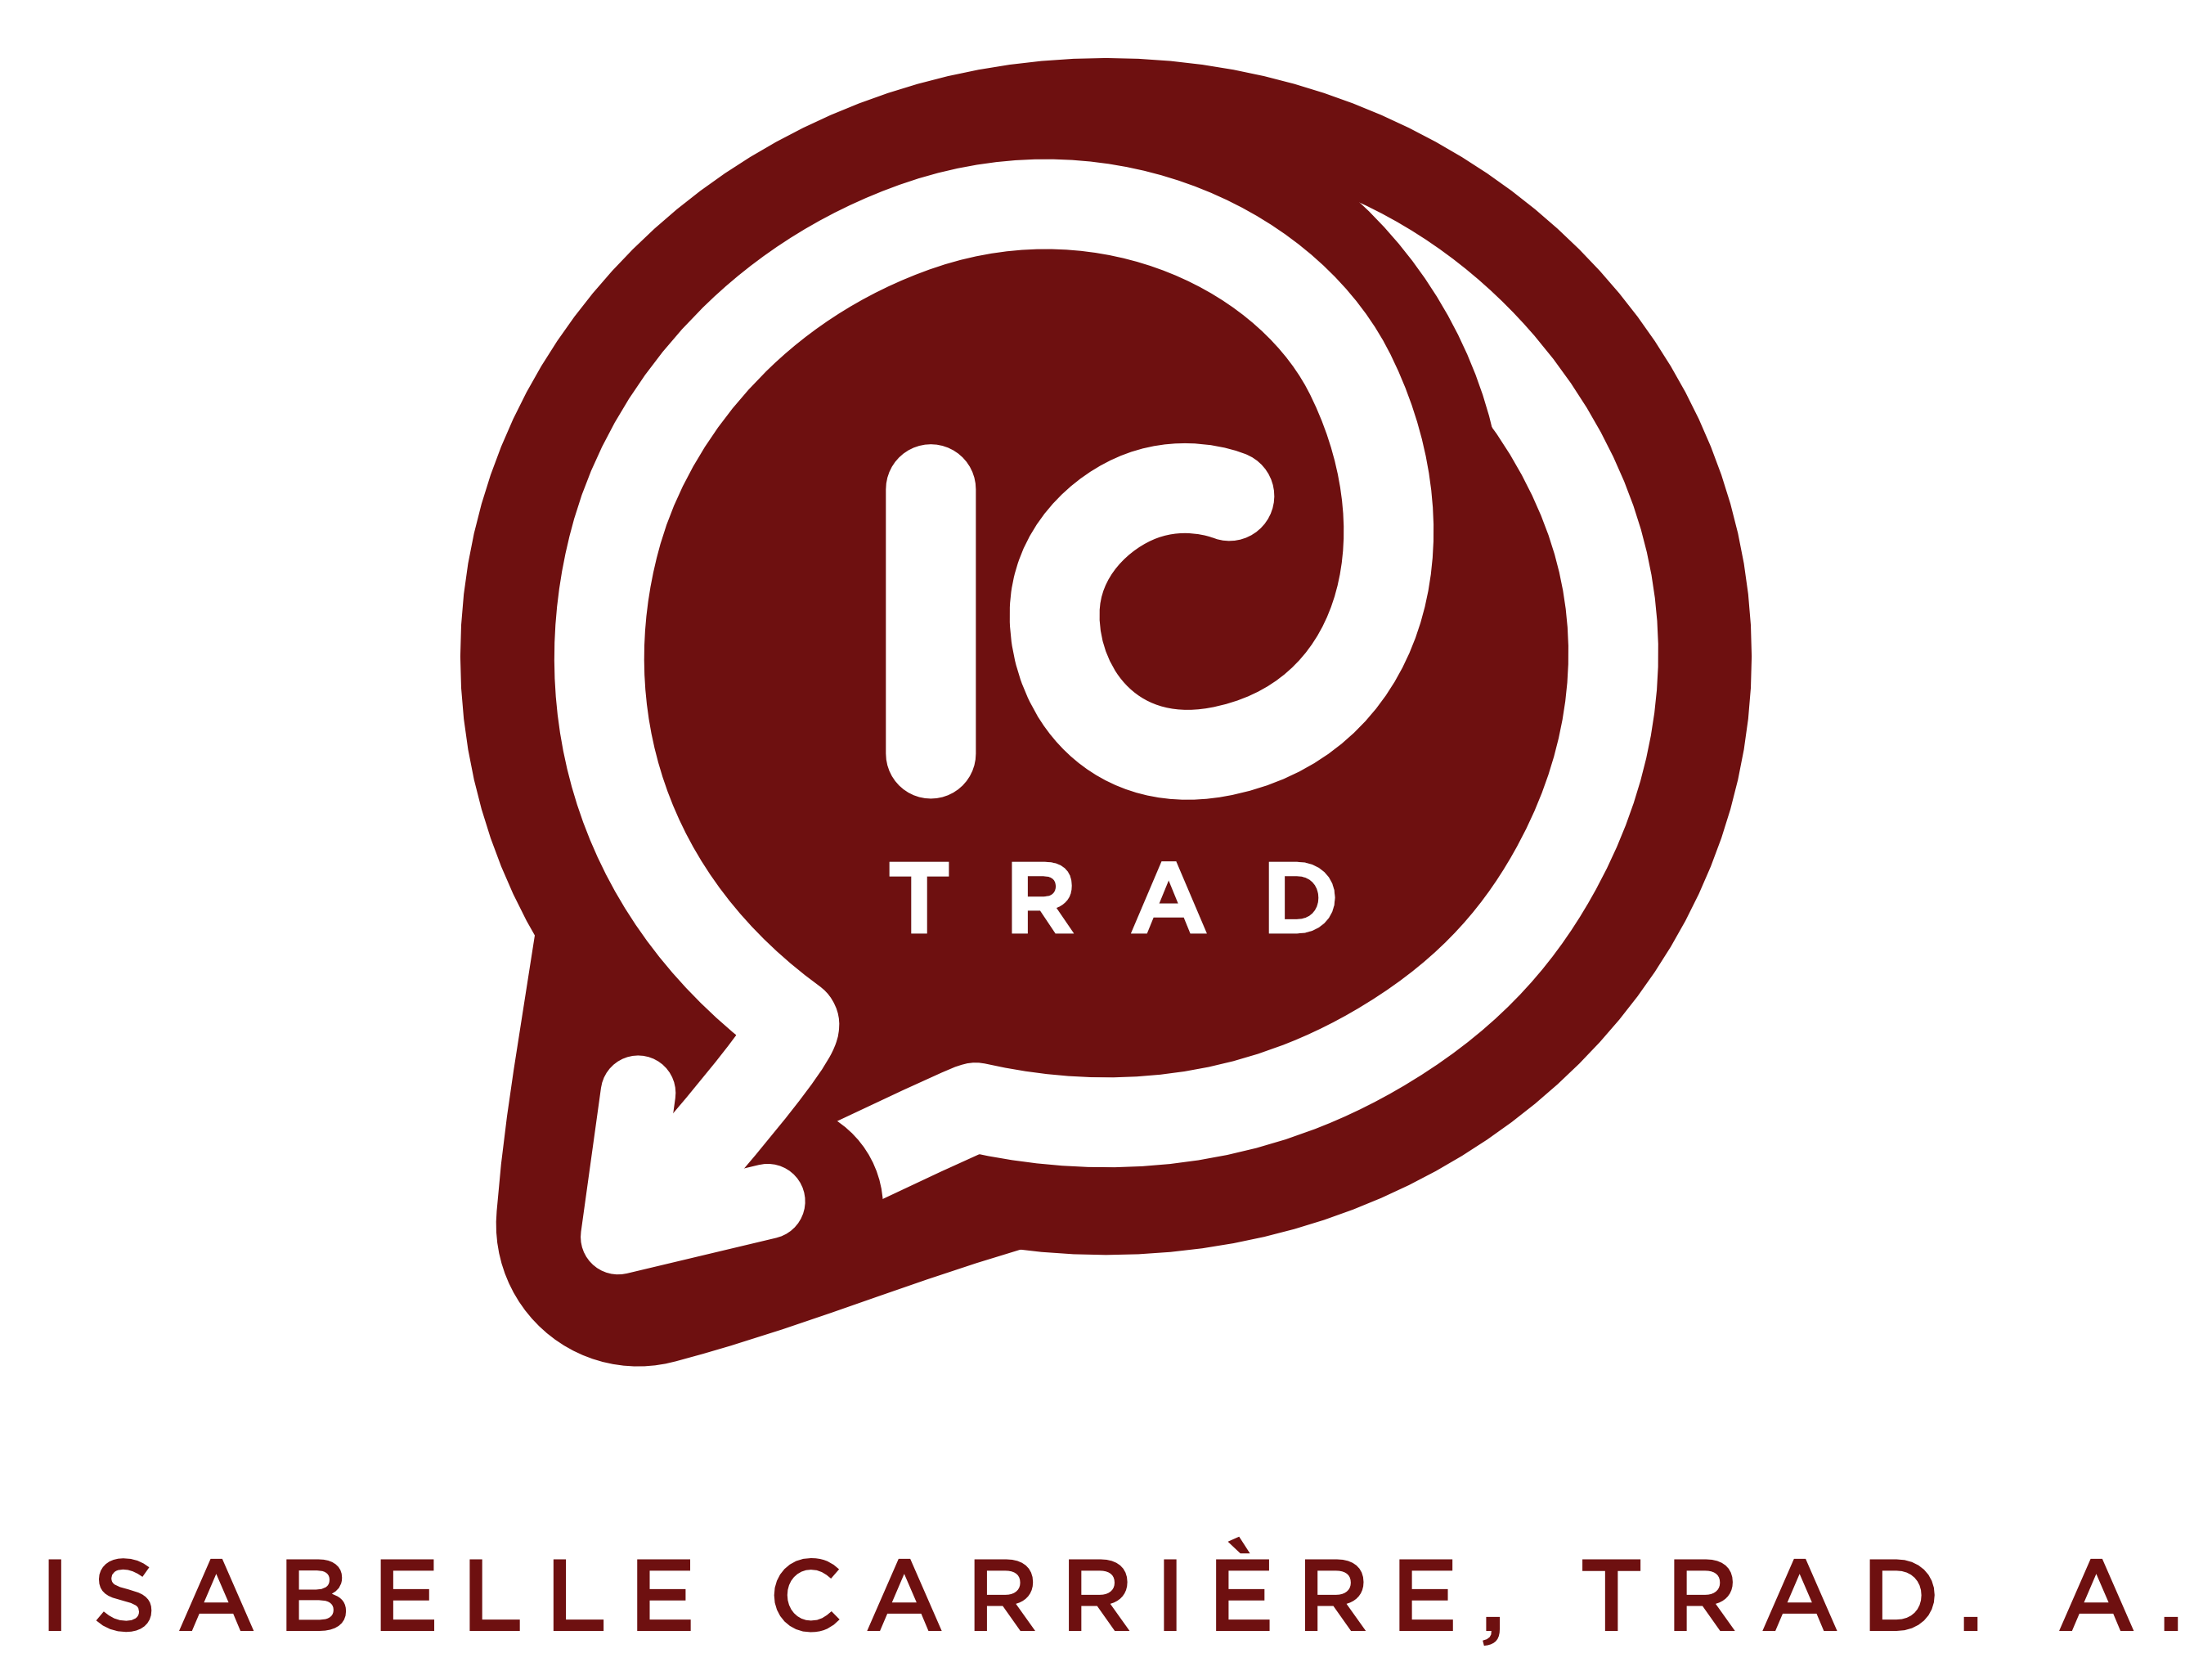 Isabelle Carrière, trad. a.